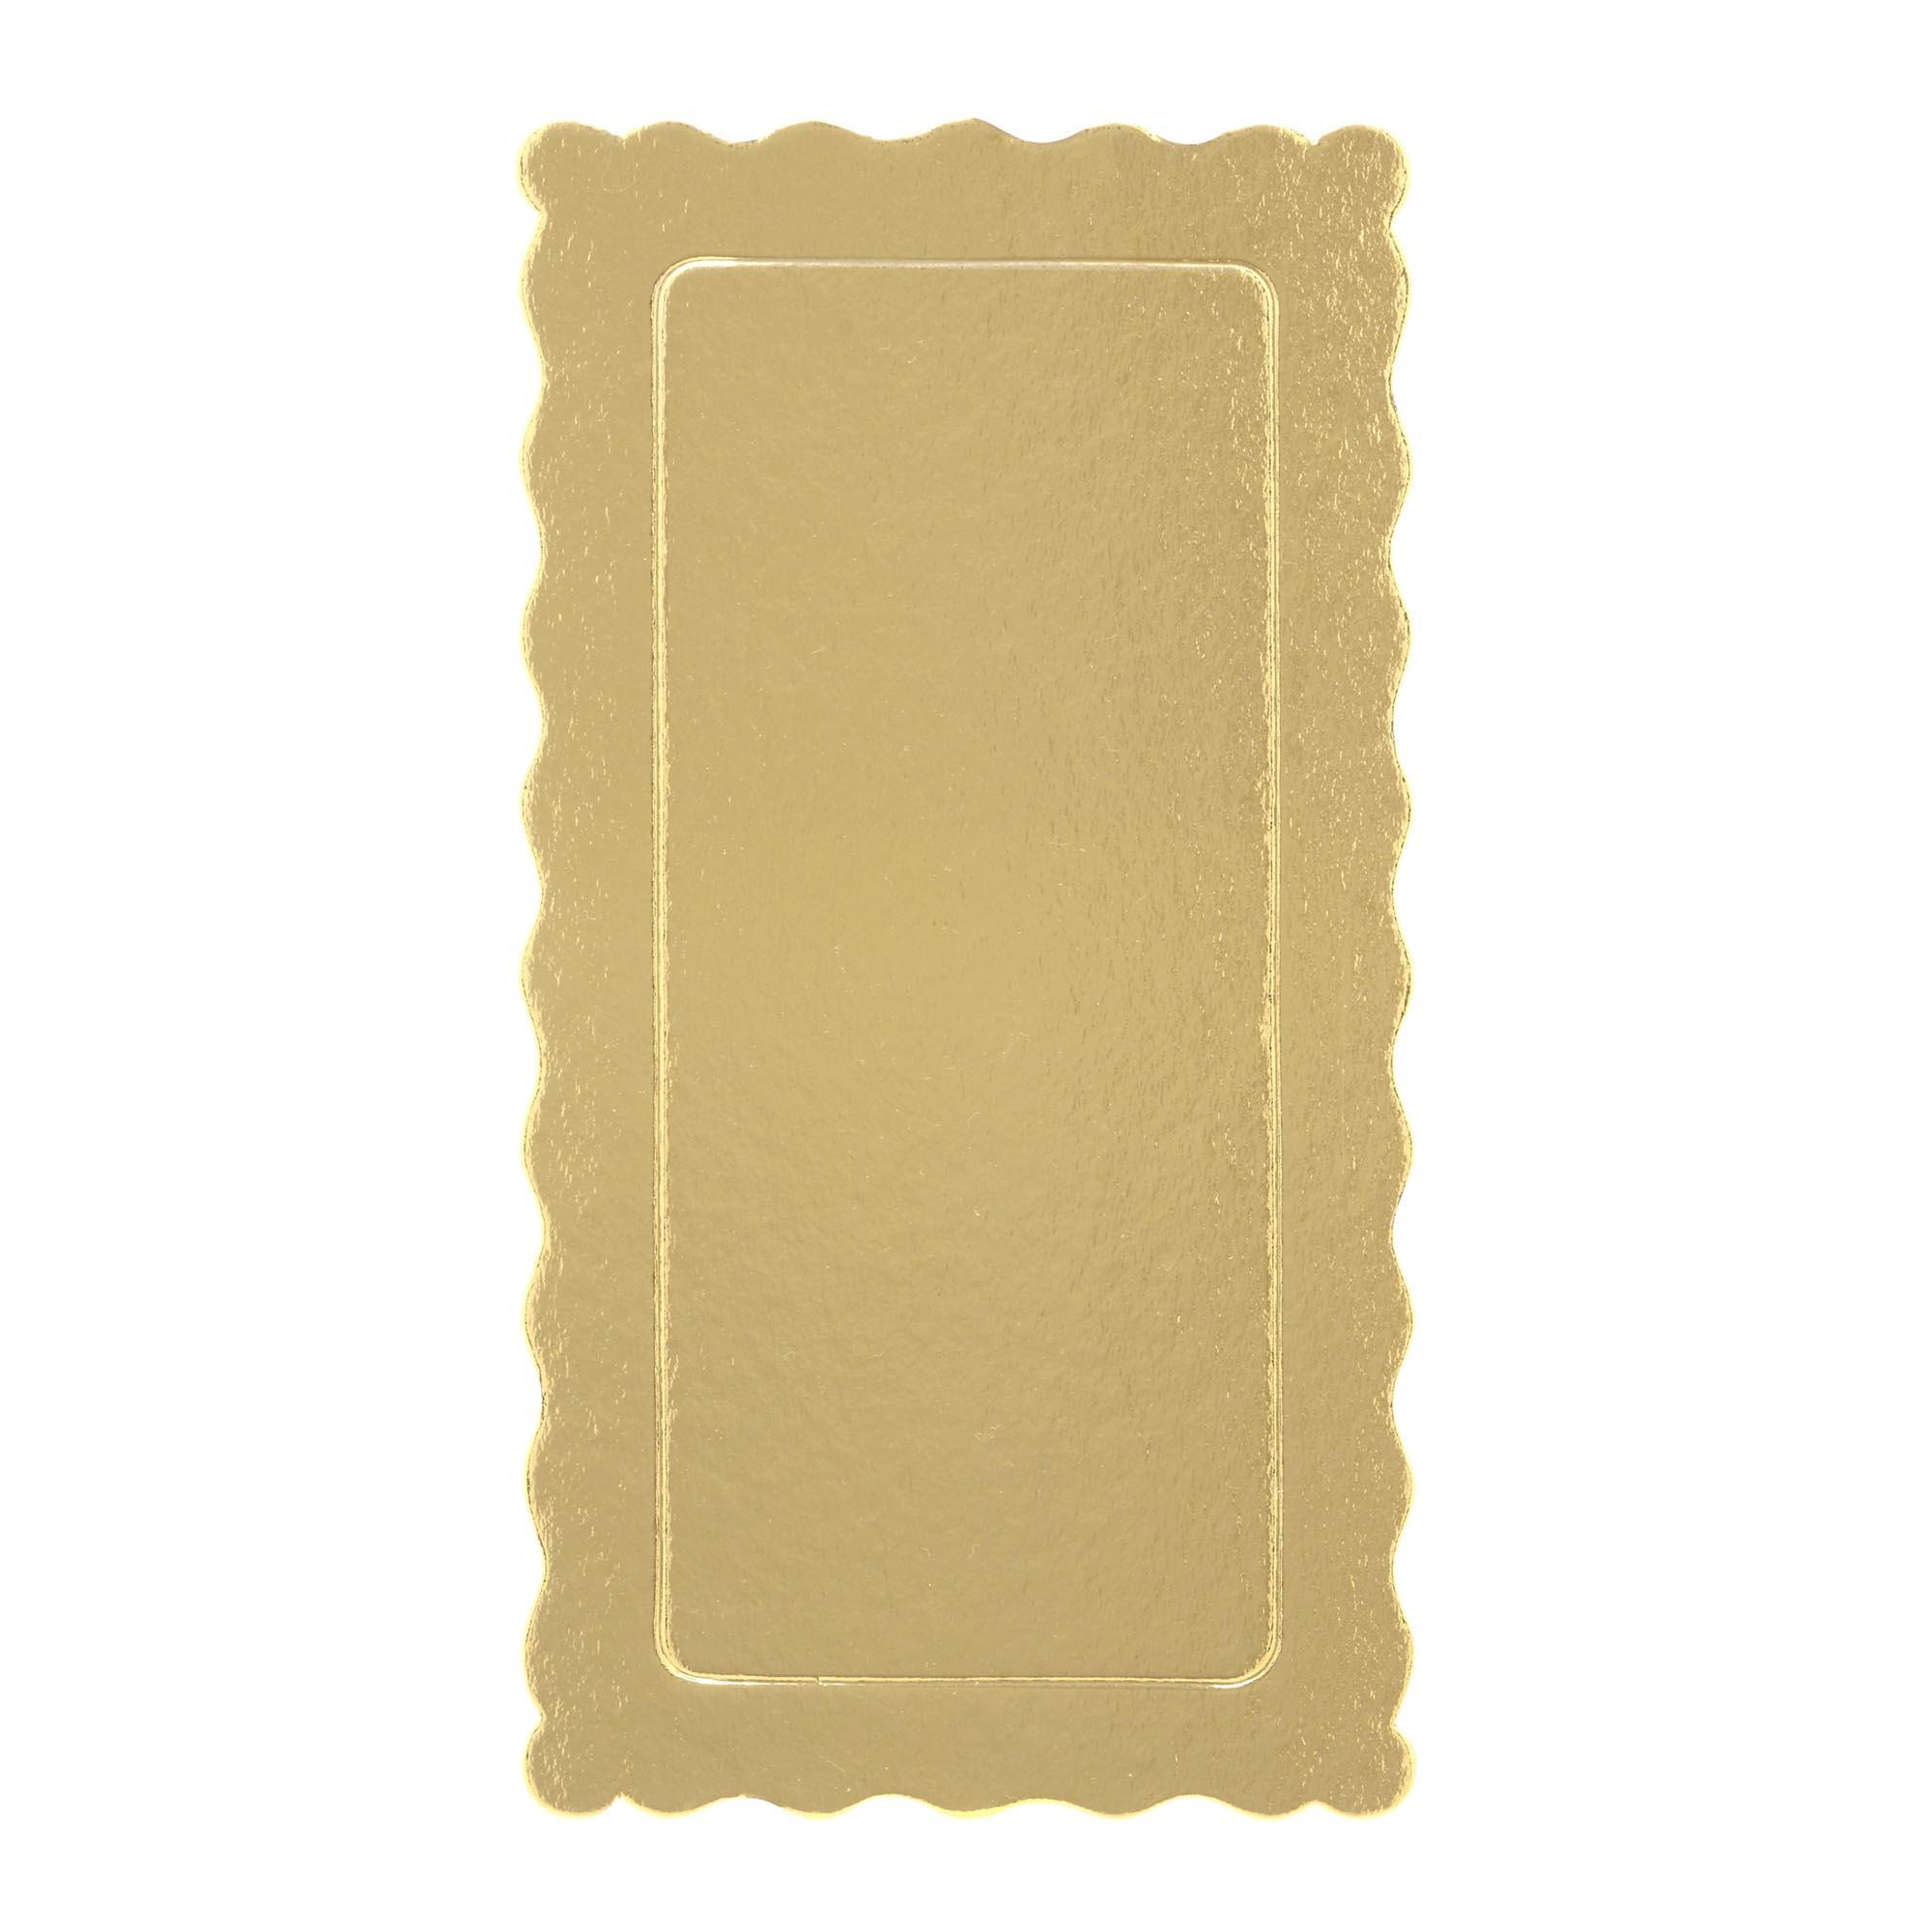 50 Bases Laminadas, Suporte P/ Bolo, Cake Board, 29x15cm - Ouro